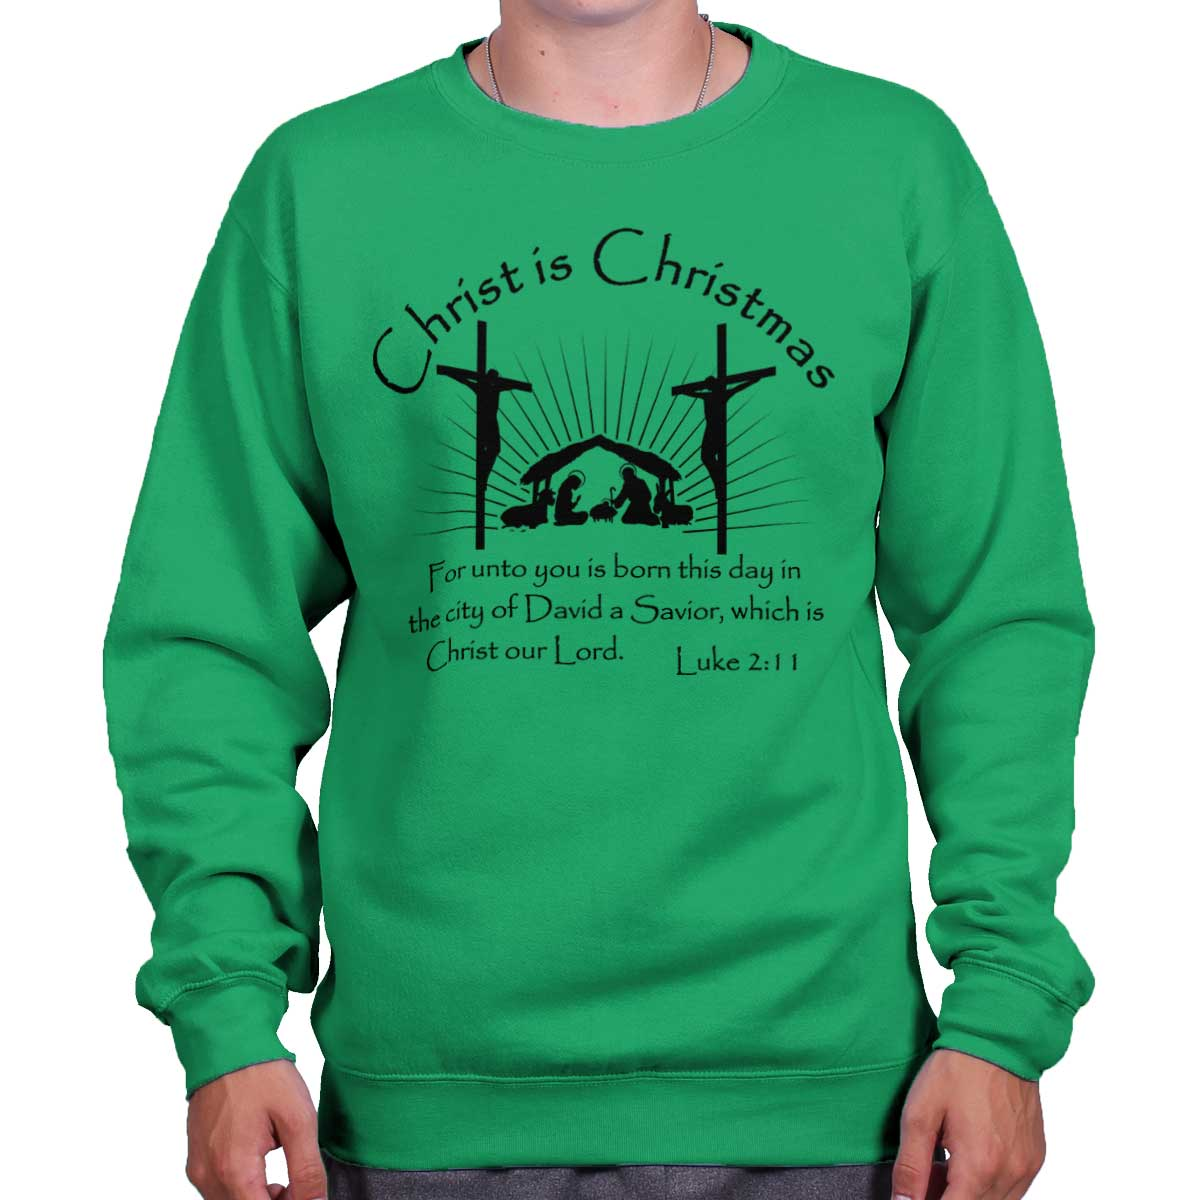 b468b2d41 Brisco Brands - Jesus Christ Christmas Christian Shirt Holiday ...